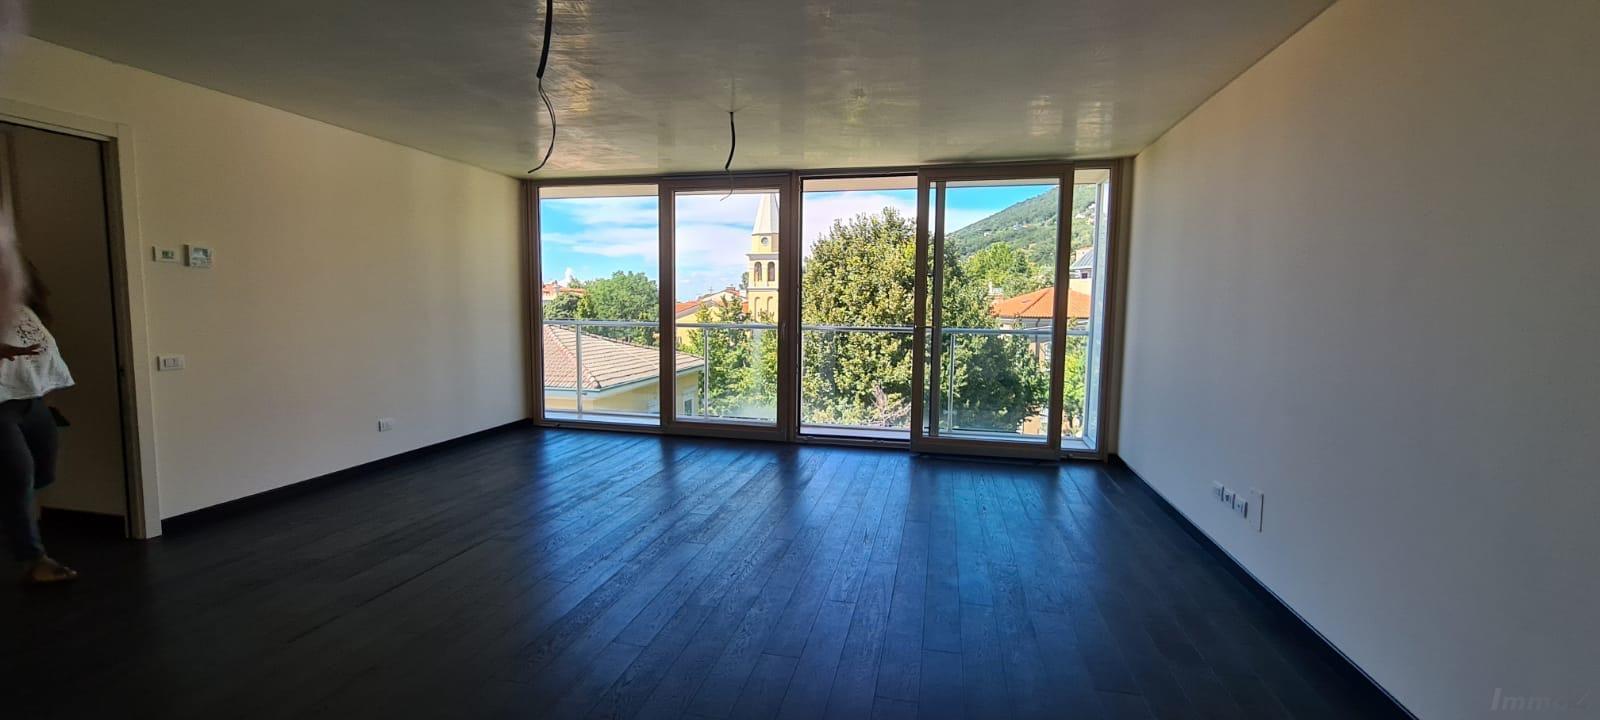 Apartments Barcola (3)